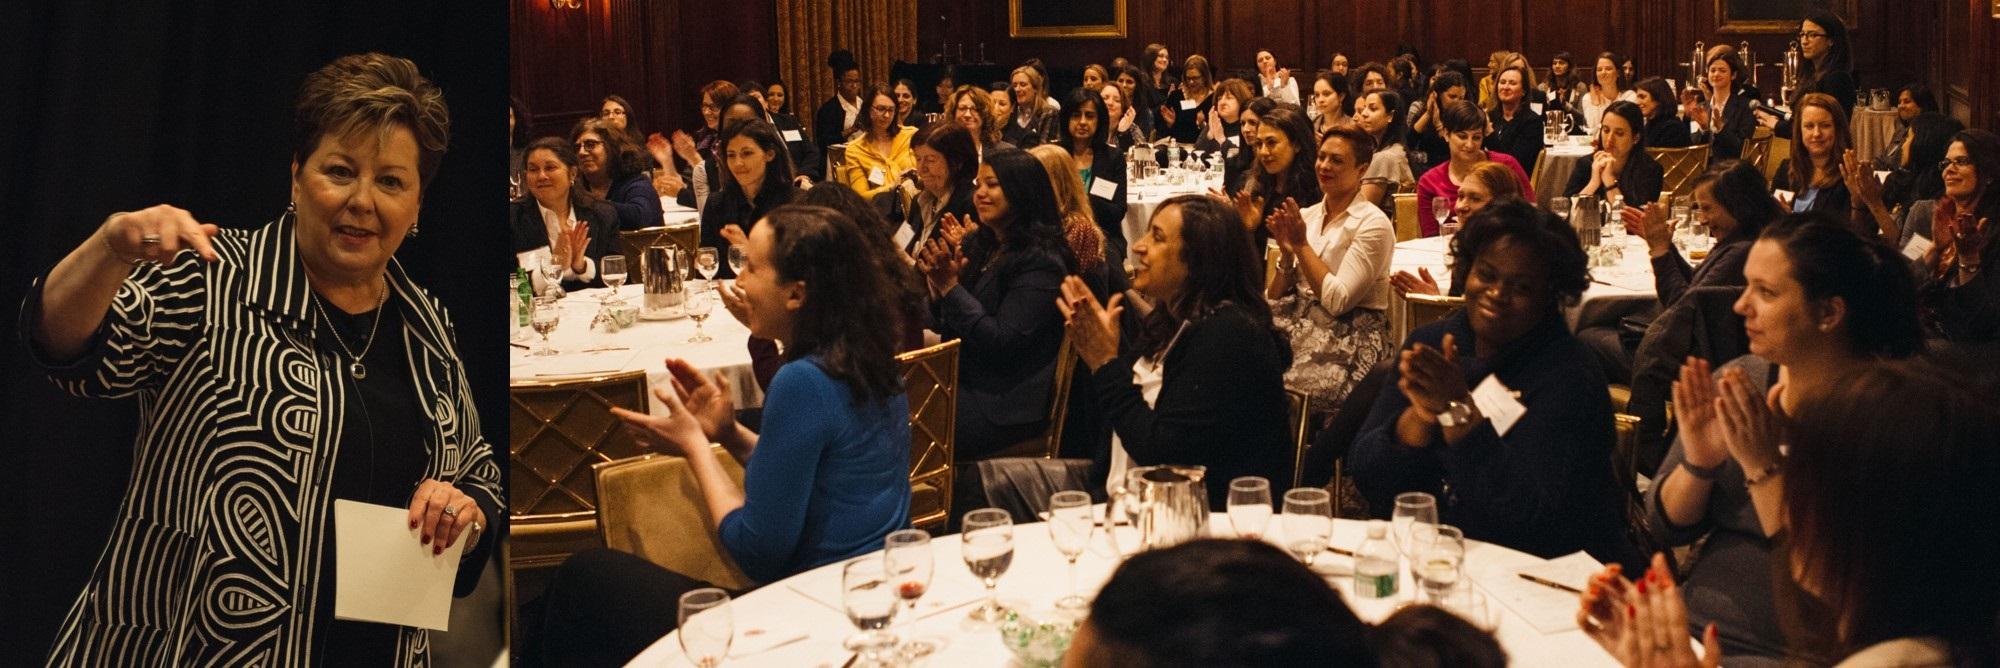 Carol Frohlinger Speaks About Negotiation to Women